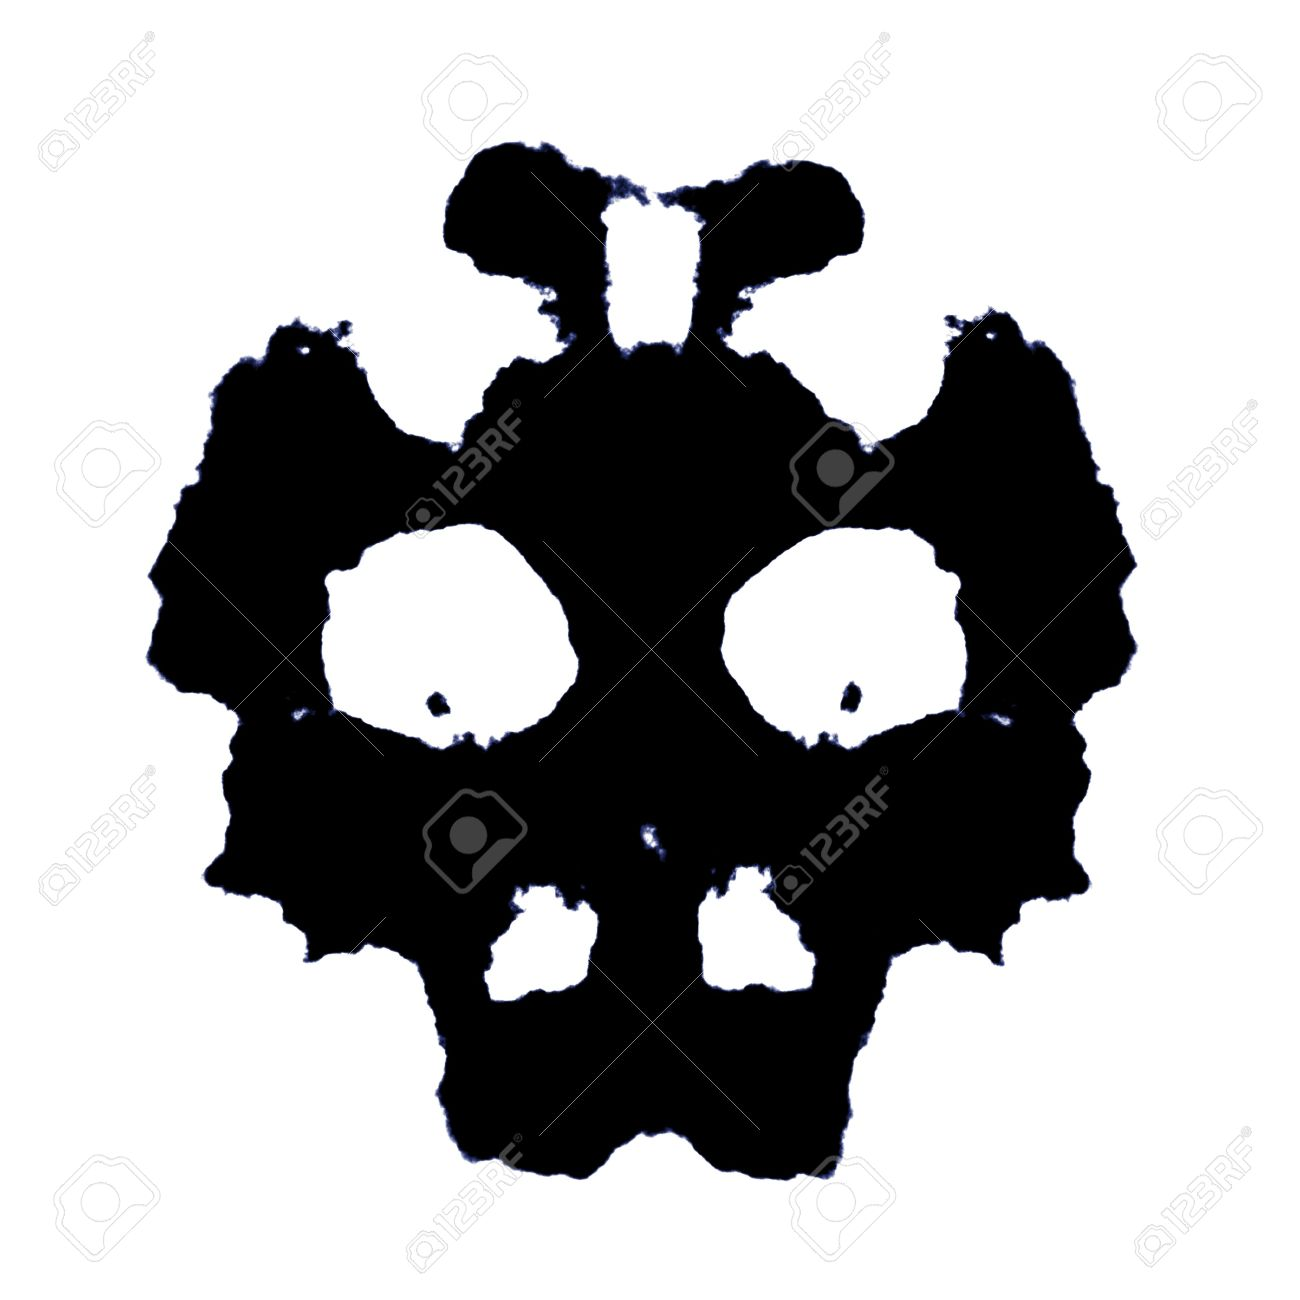 Rorschach test clipart clipground - Test di rorschach tavola 1 ...